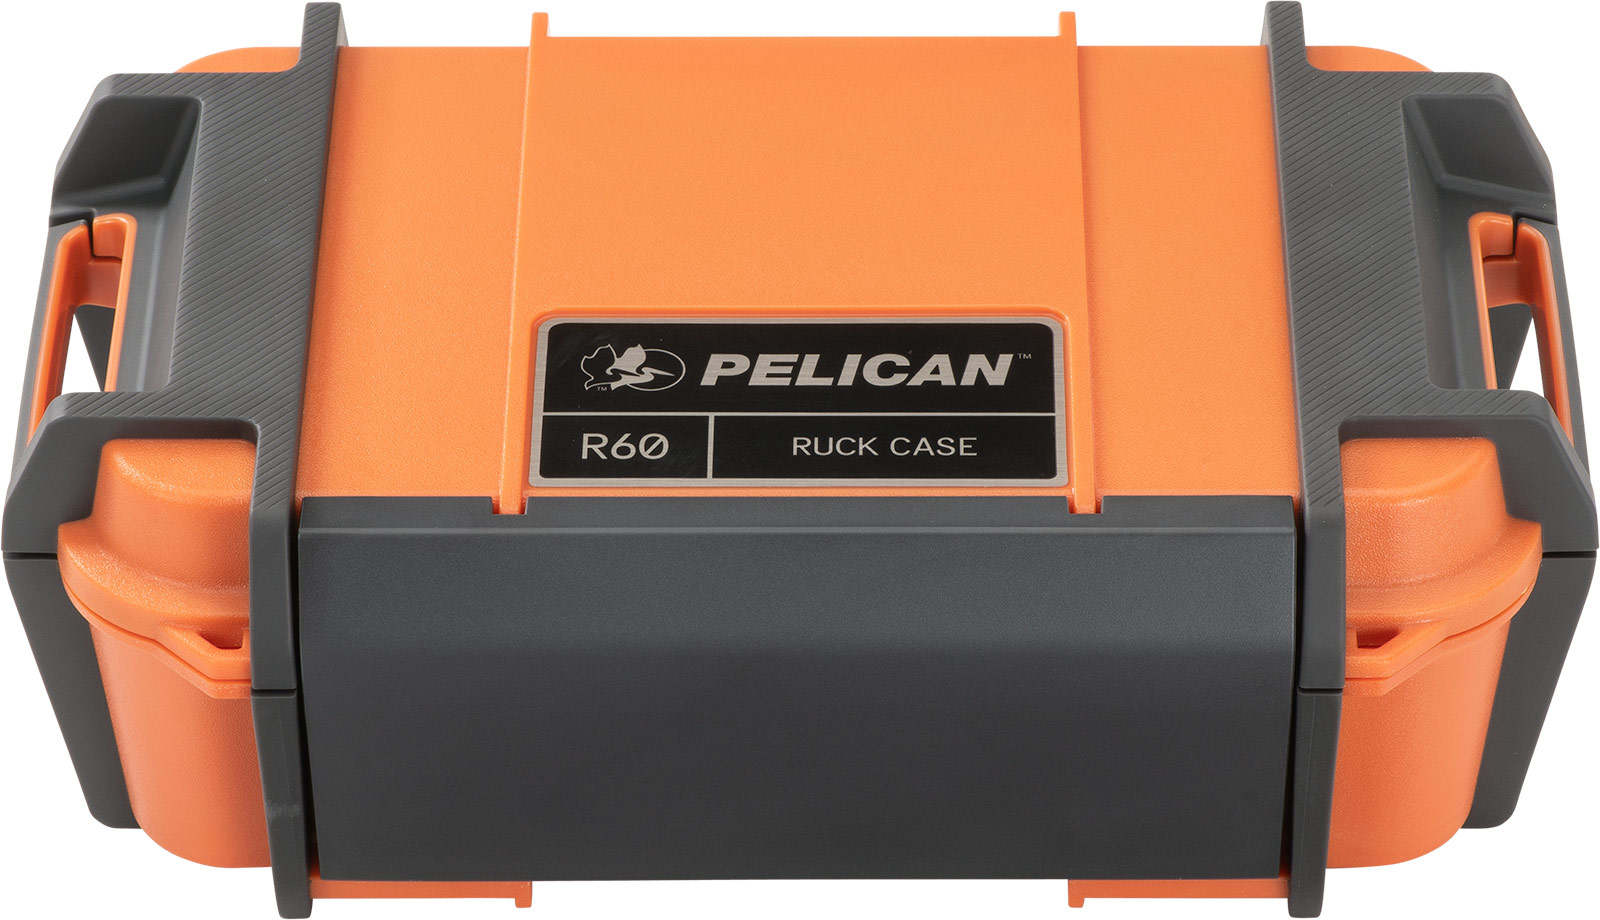 pelican ruck r60 organization hiking case